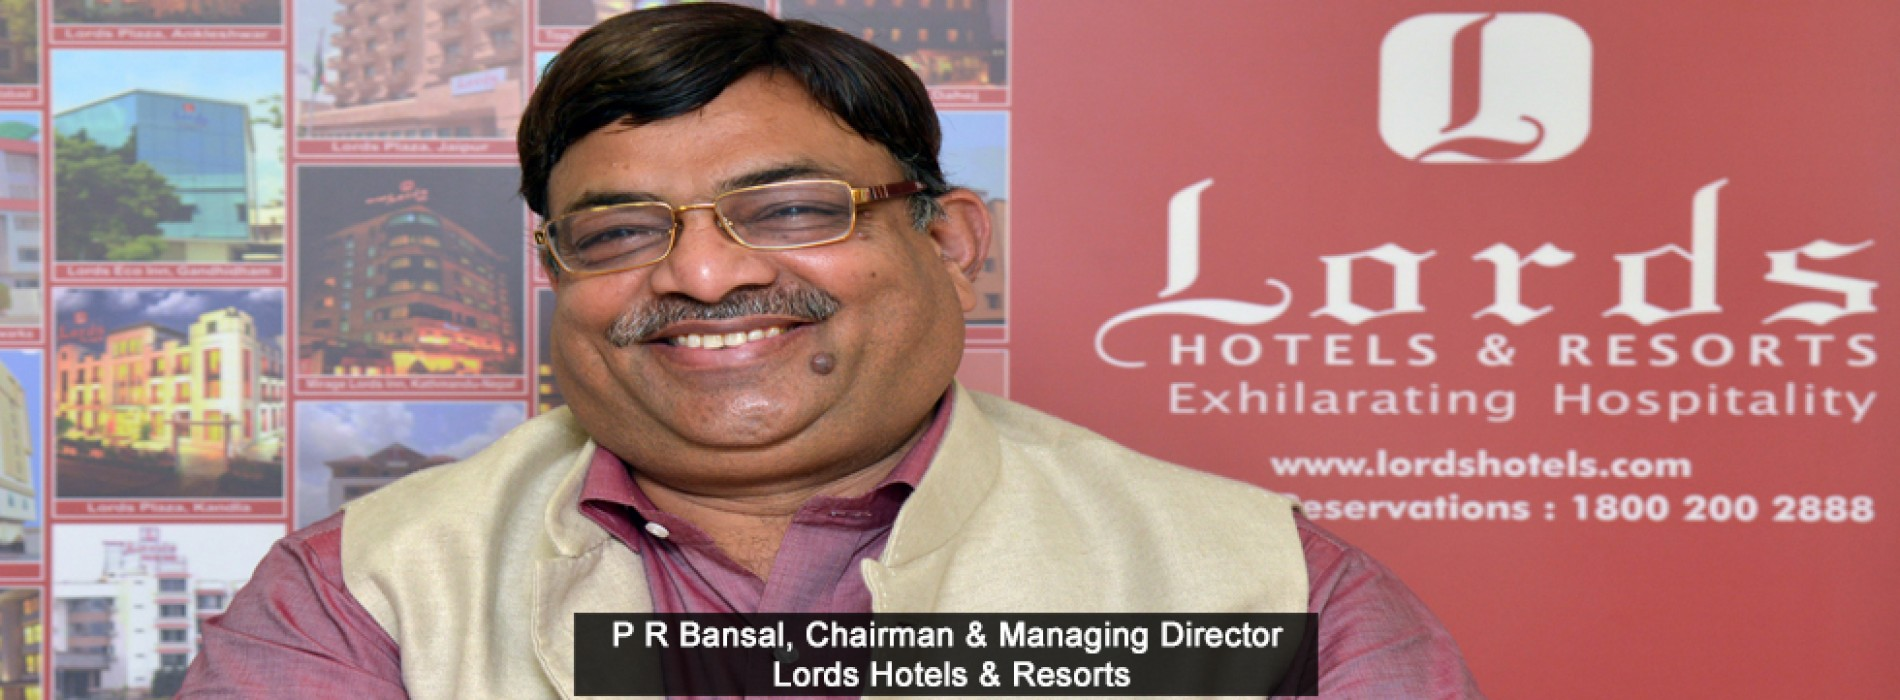 Lords Hotels & Resorts wins accolades at Gujarat's Tourism Awards 2017